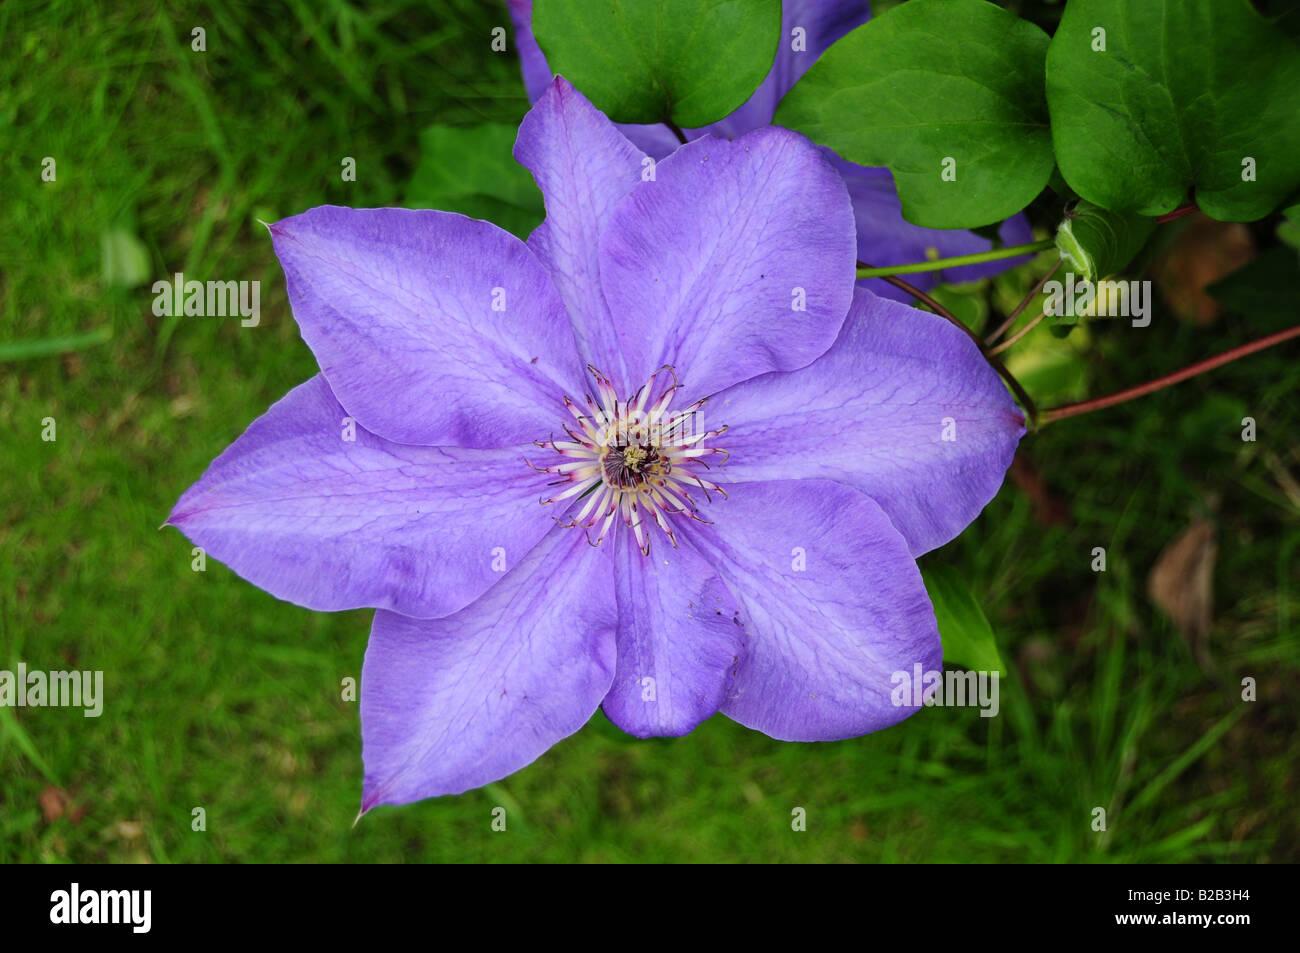 Clematis flower - 'Elsa Spath' - Stock Image